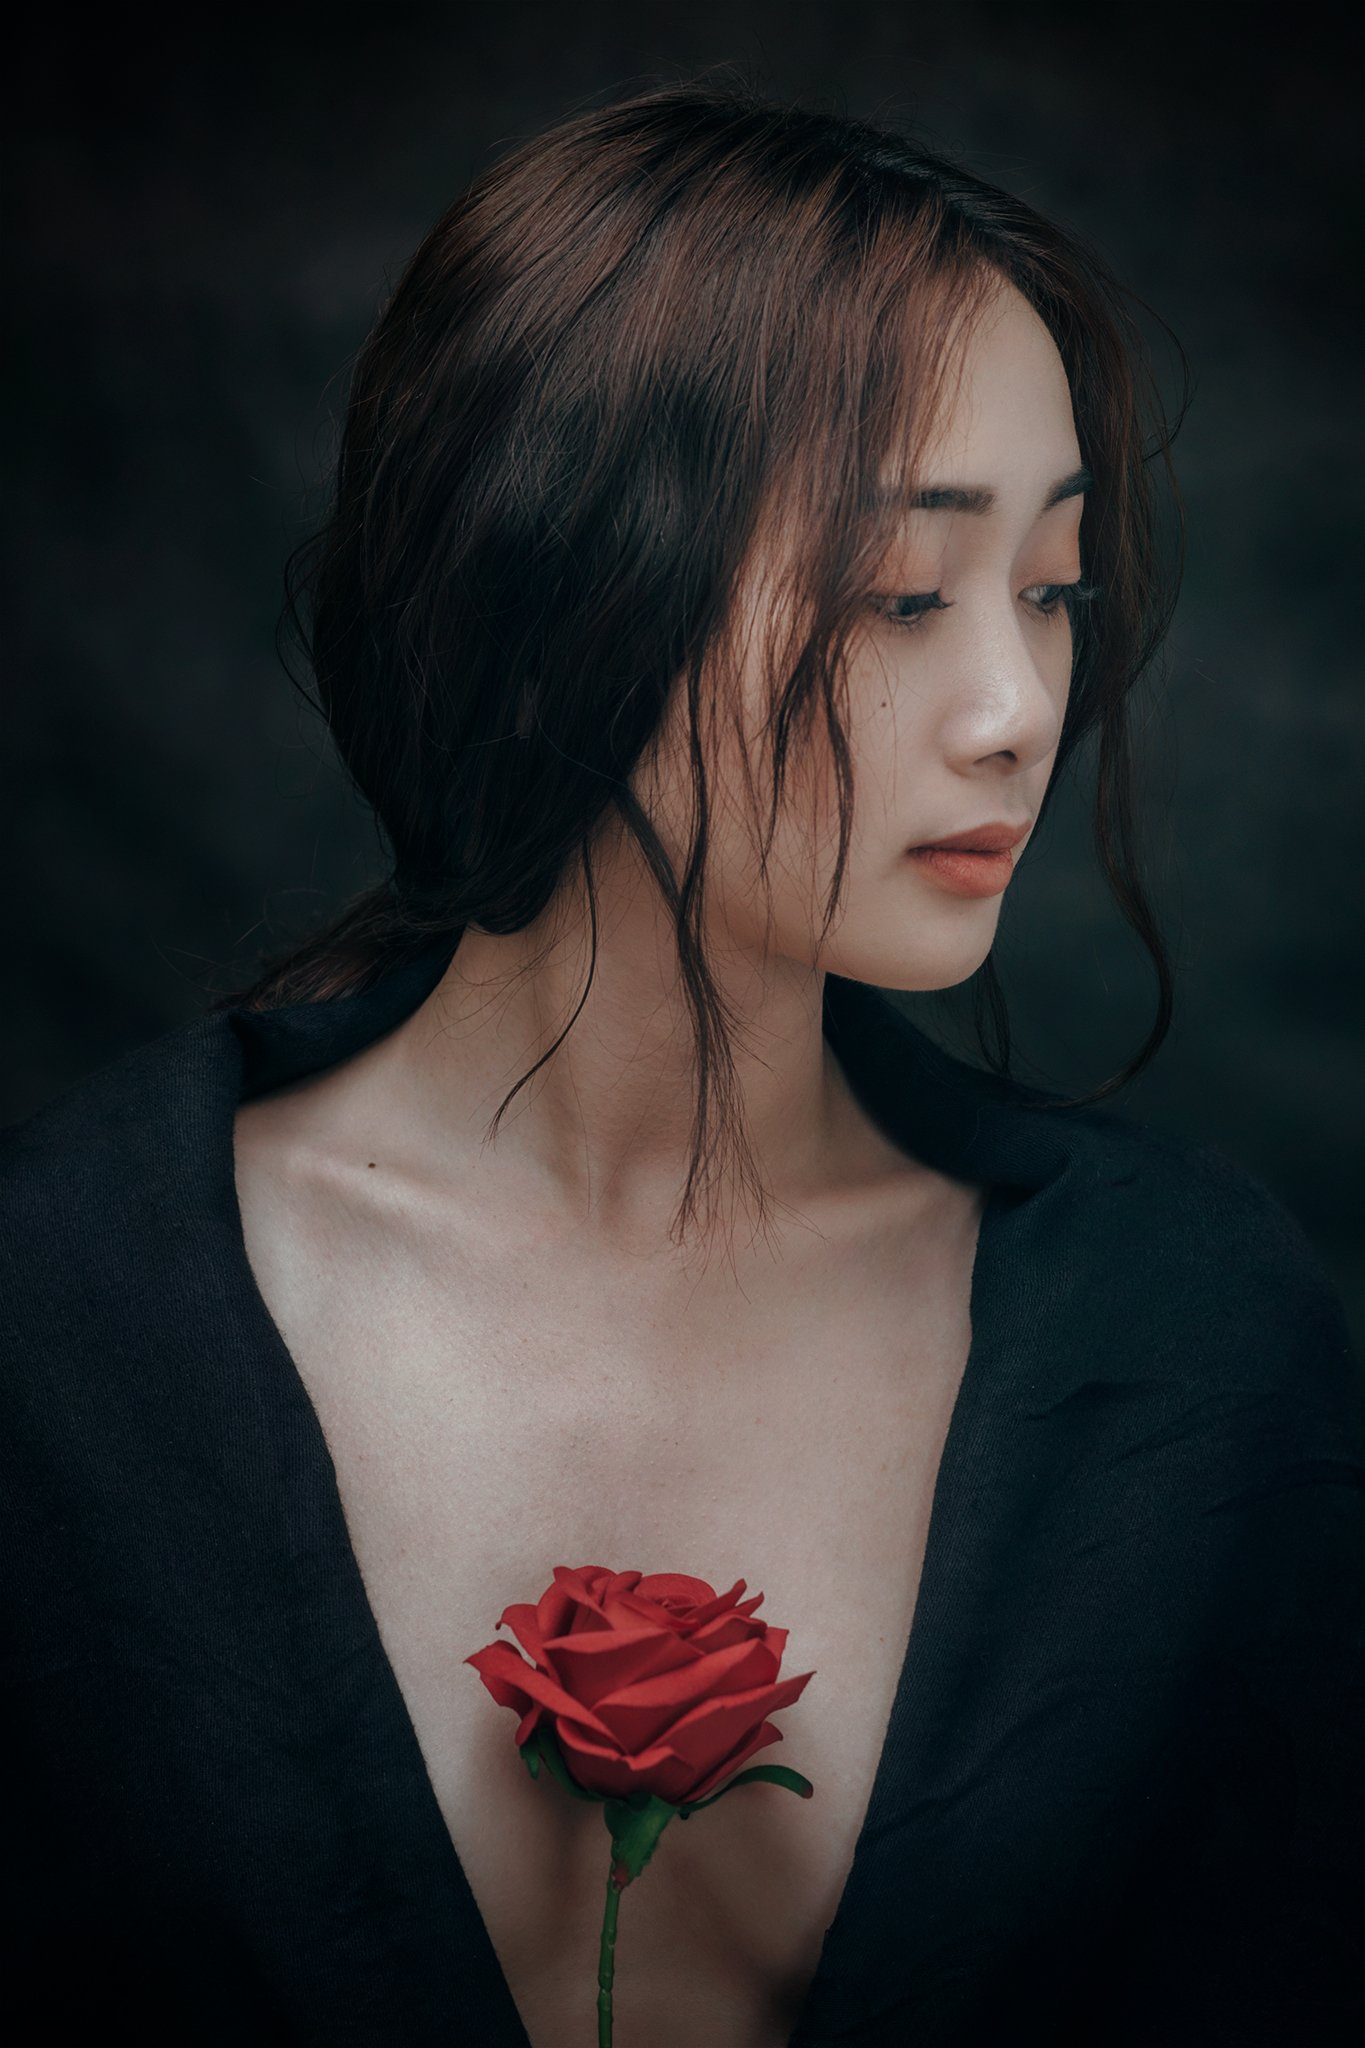 people, portrait, girl, asian, vietnam, vietnamese, face, young, beauty, glamour, mood portrait, mood, flowers, rose, Hoang Viet Nguyen